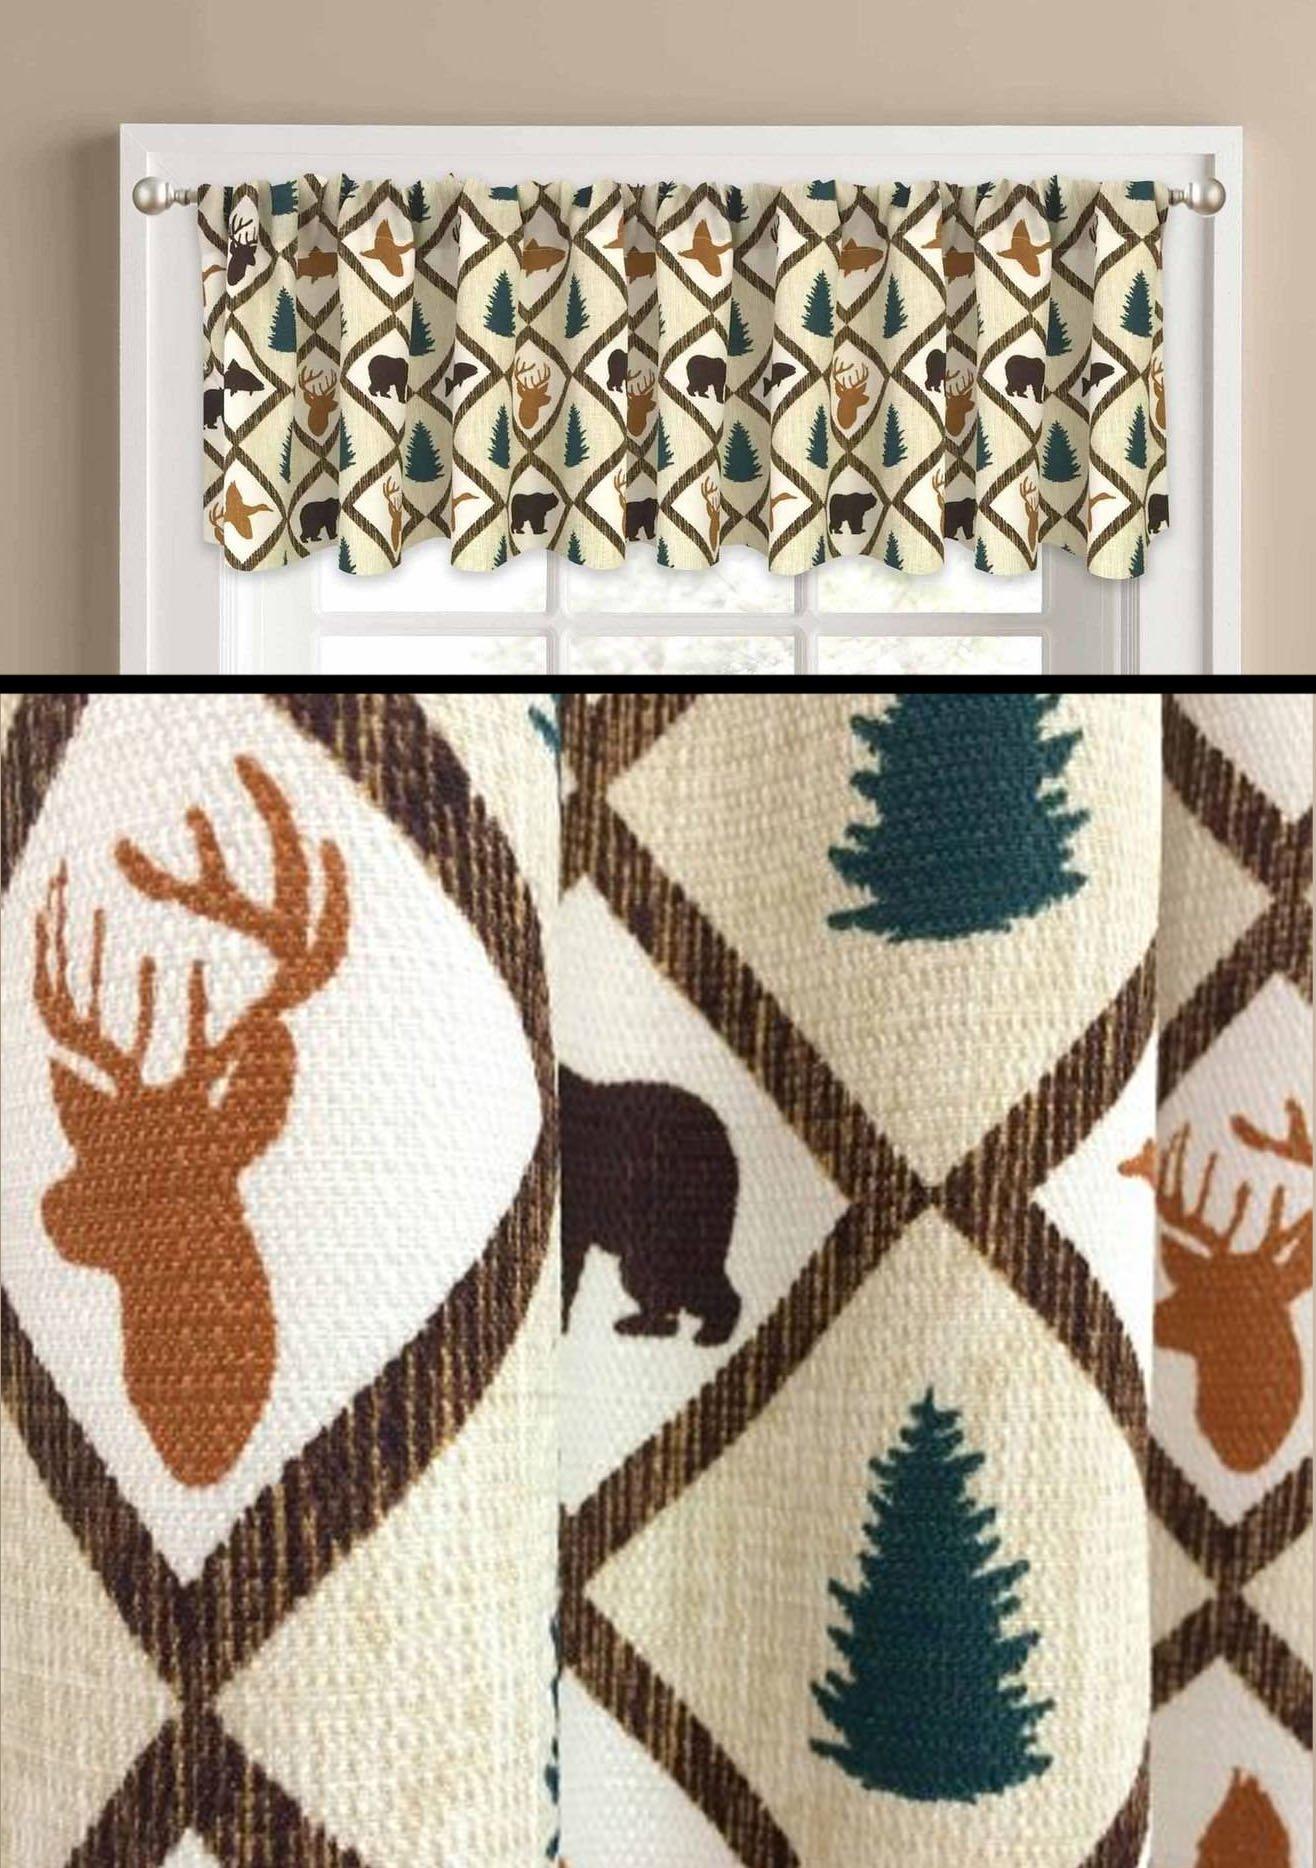 Textured Woodland Valance Window Rustic Primitive Tree Lodge Cabin